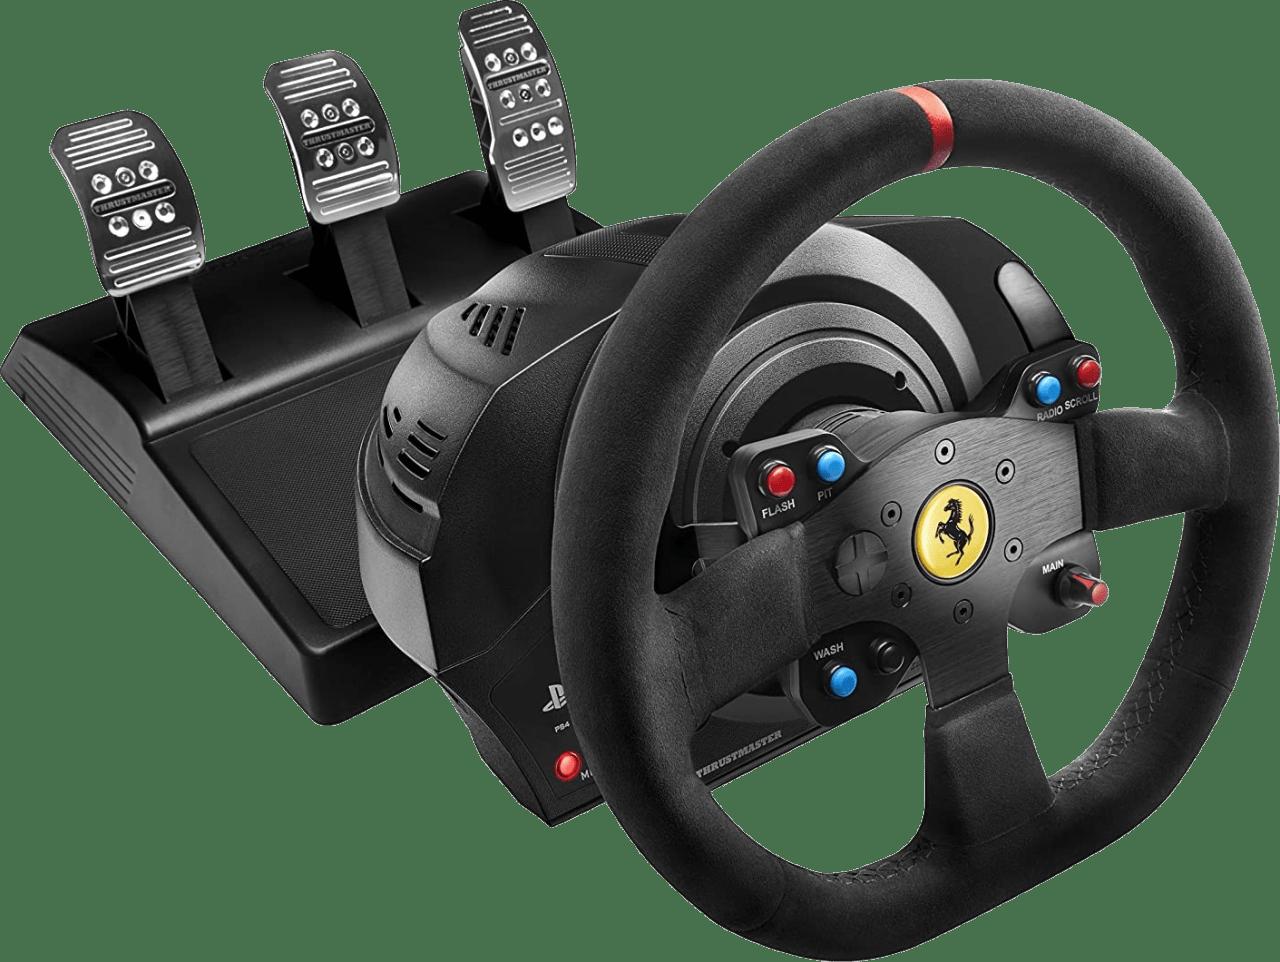 Black Thrustmaster T300 Ferrari Racing Steering Wheel.1